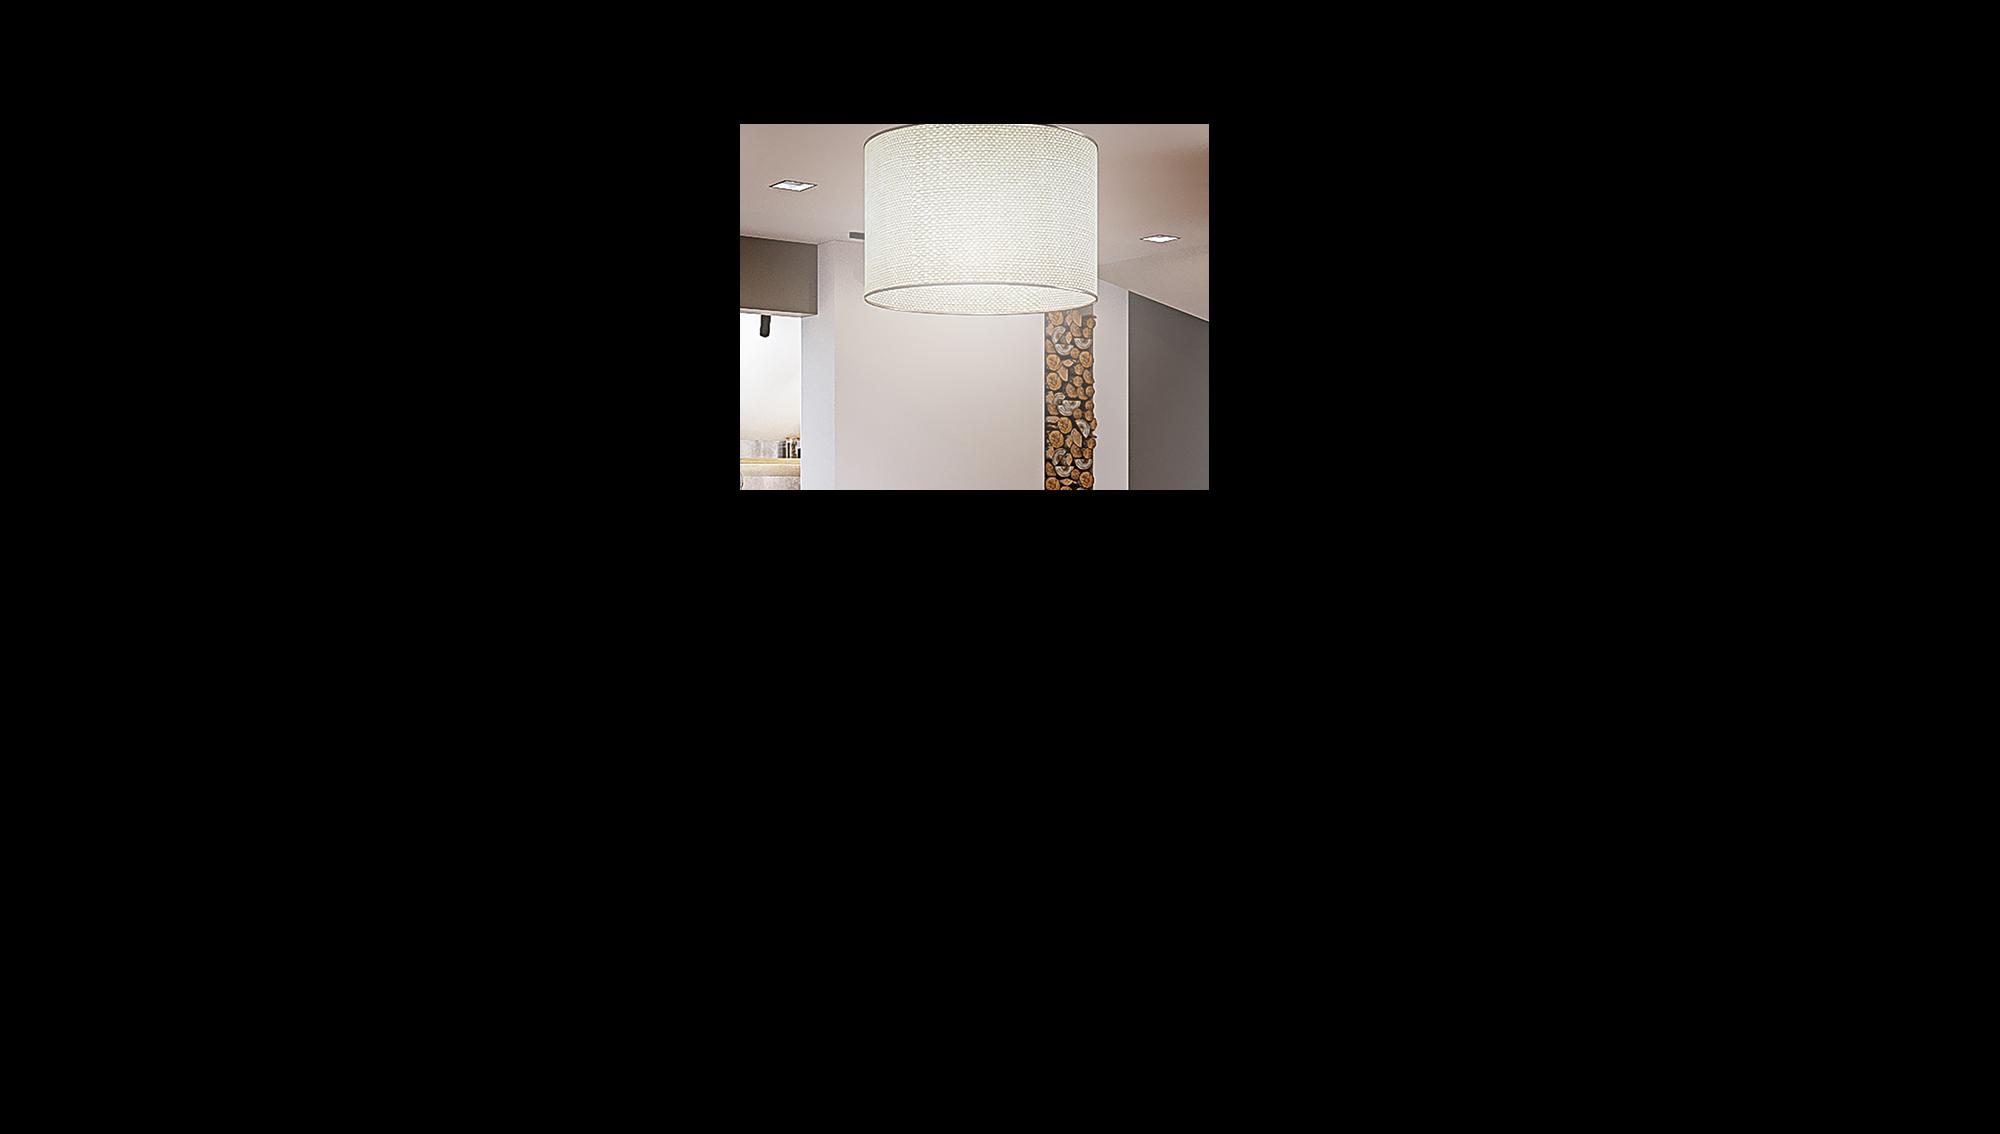 Living Room Lights Overlay